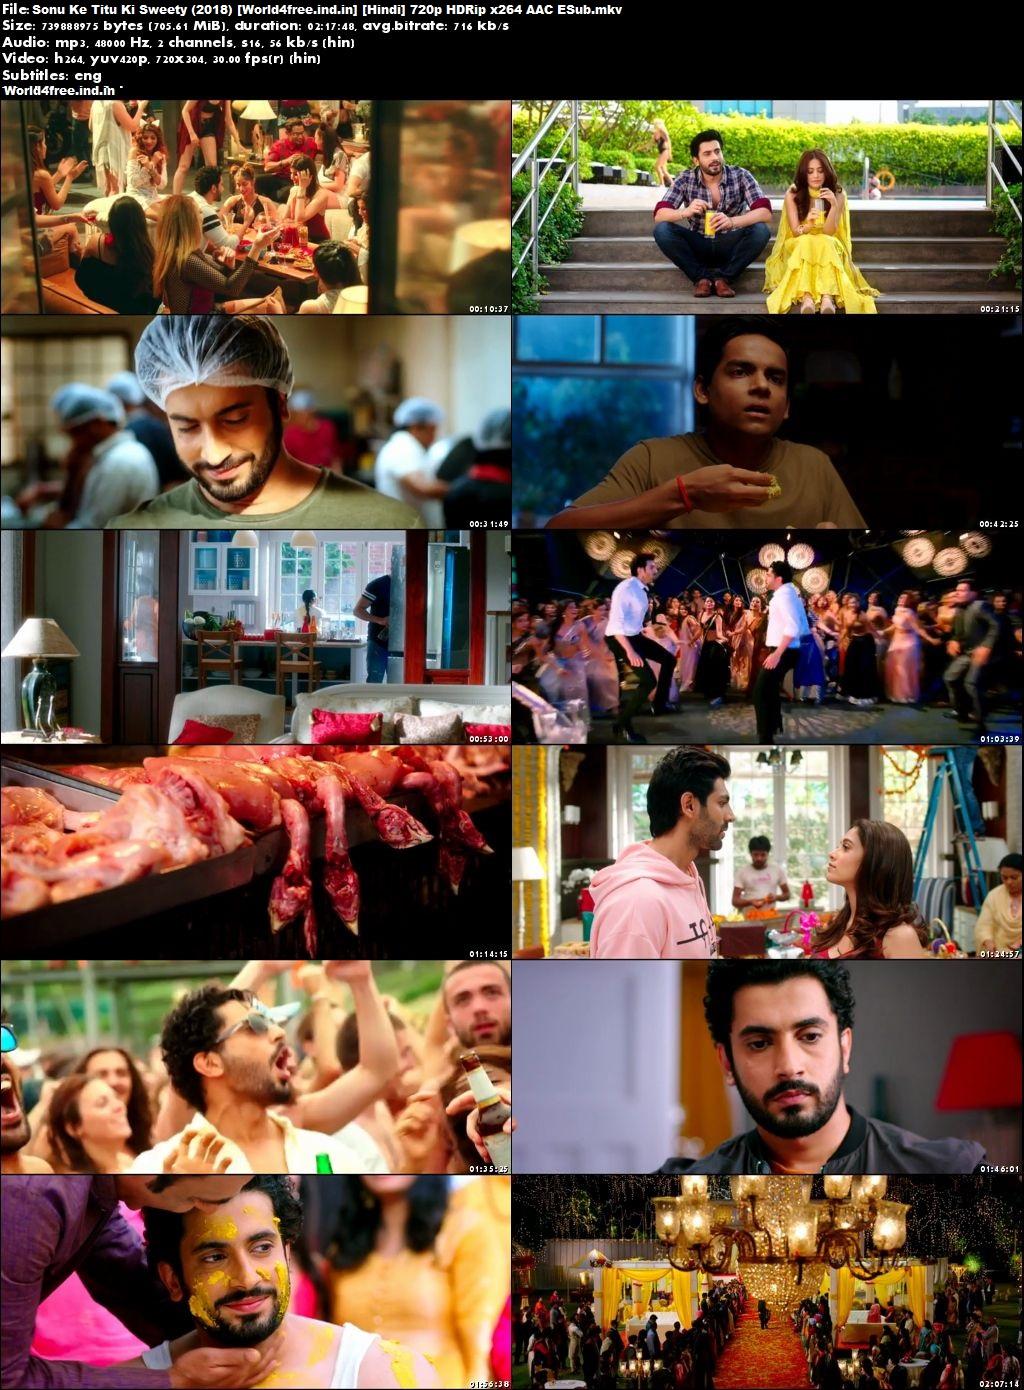 Sonu Ke Titu Ki Sweety 2018 world4free.ind.in Hindi Movie Download HDRip